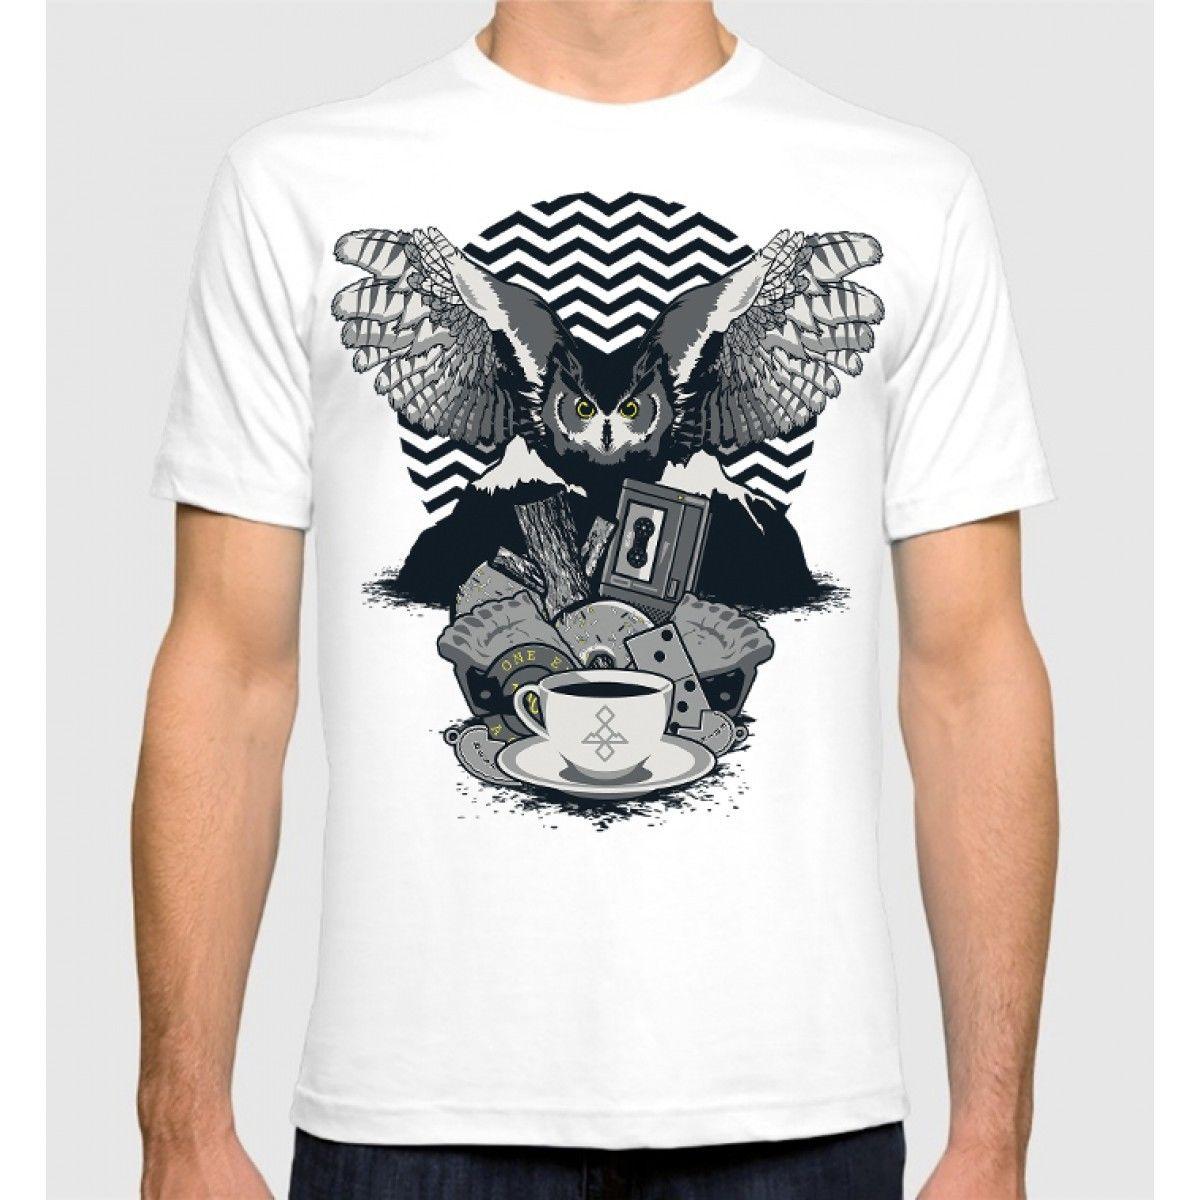 Twin Peaks Art T-Shirt David Lynch 100% Cotton Mens New Cotton Tee T Shirt Fashiont Shirt Free Shipping Top Tee Plus Size